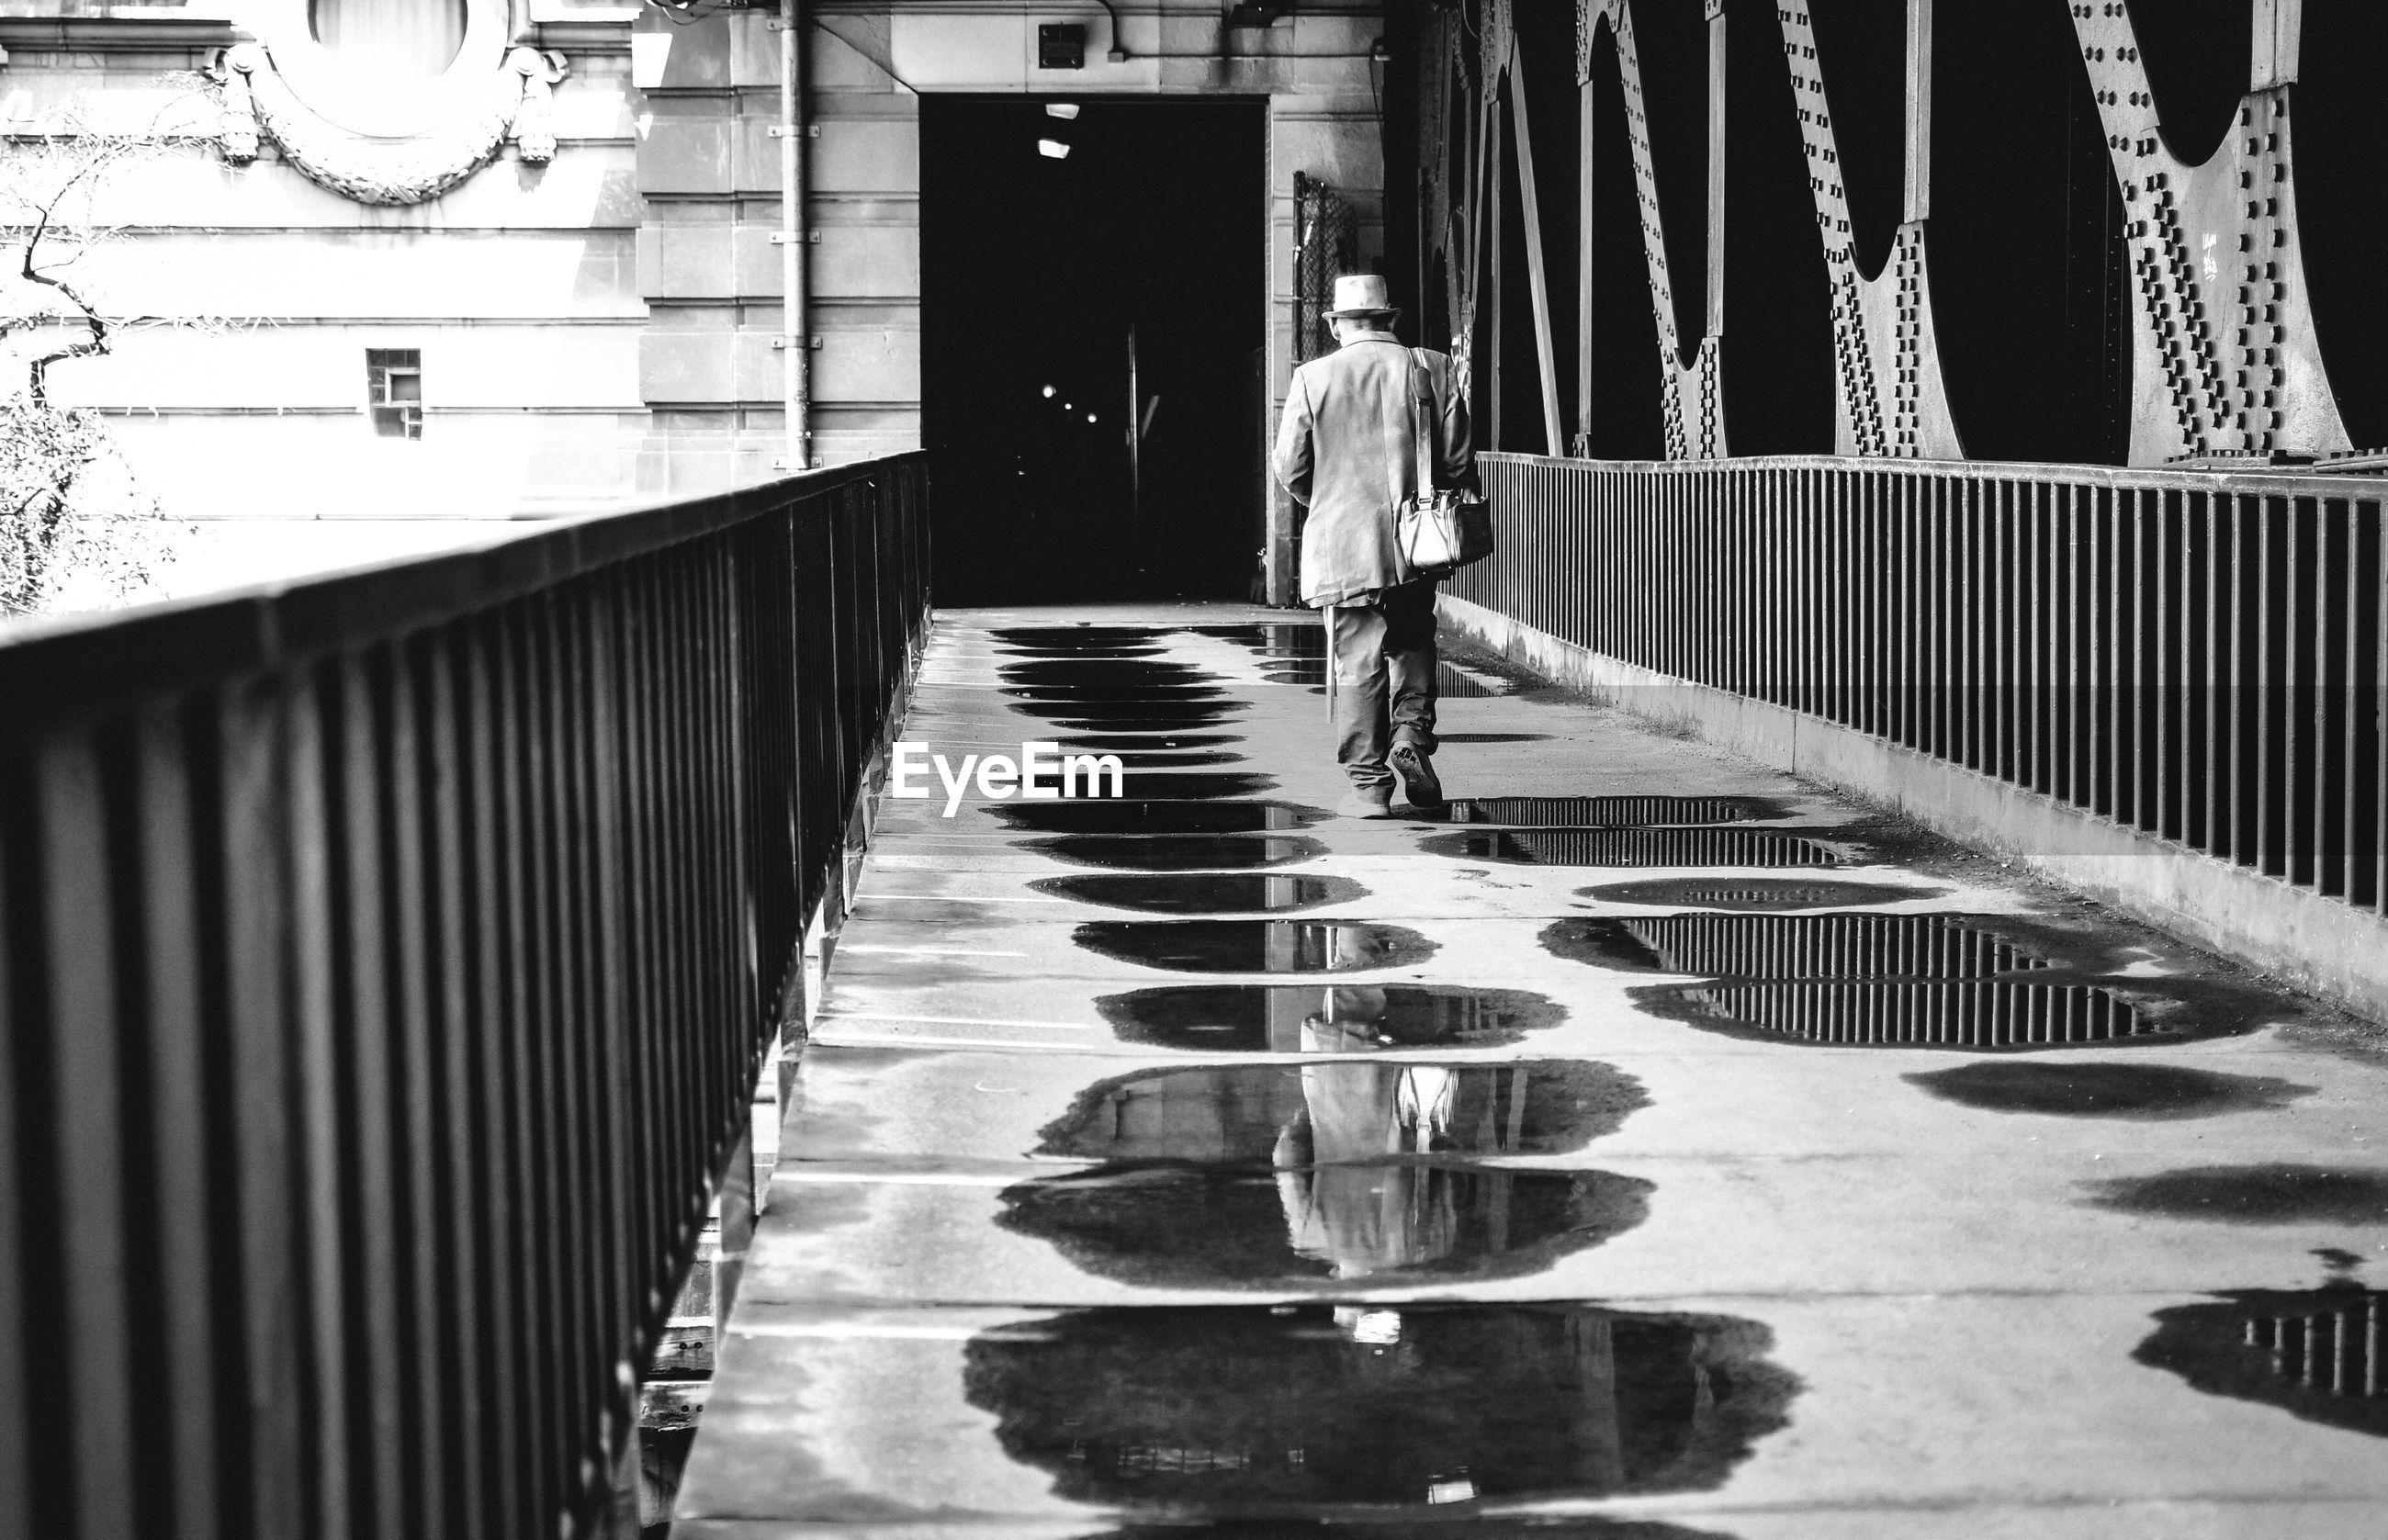 Rear view of man walking on wet footbridge